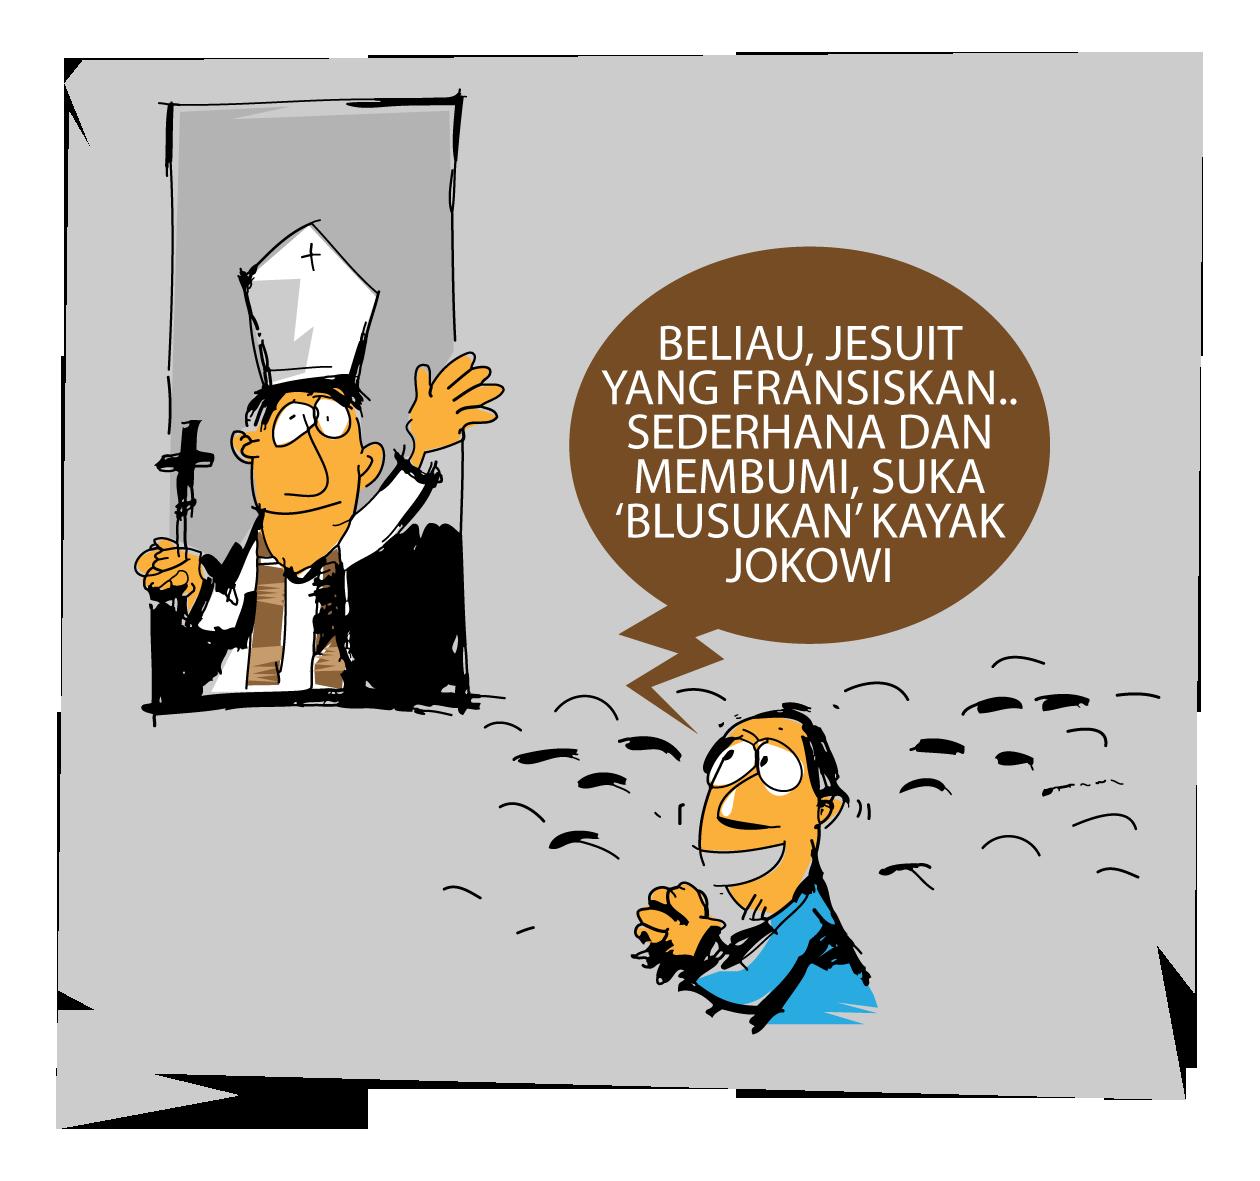 Gereja Kartun Cliparts